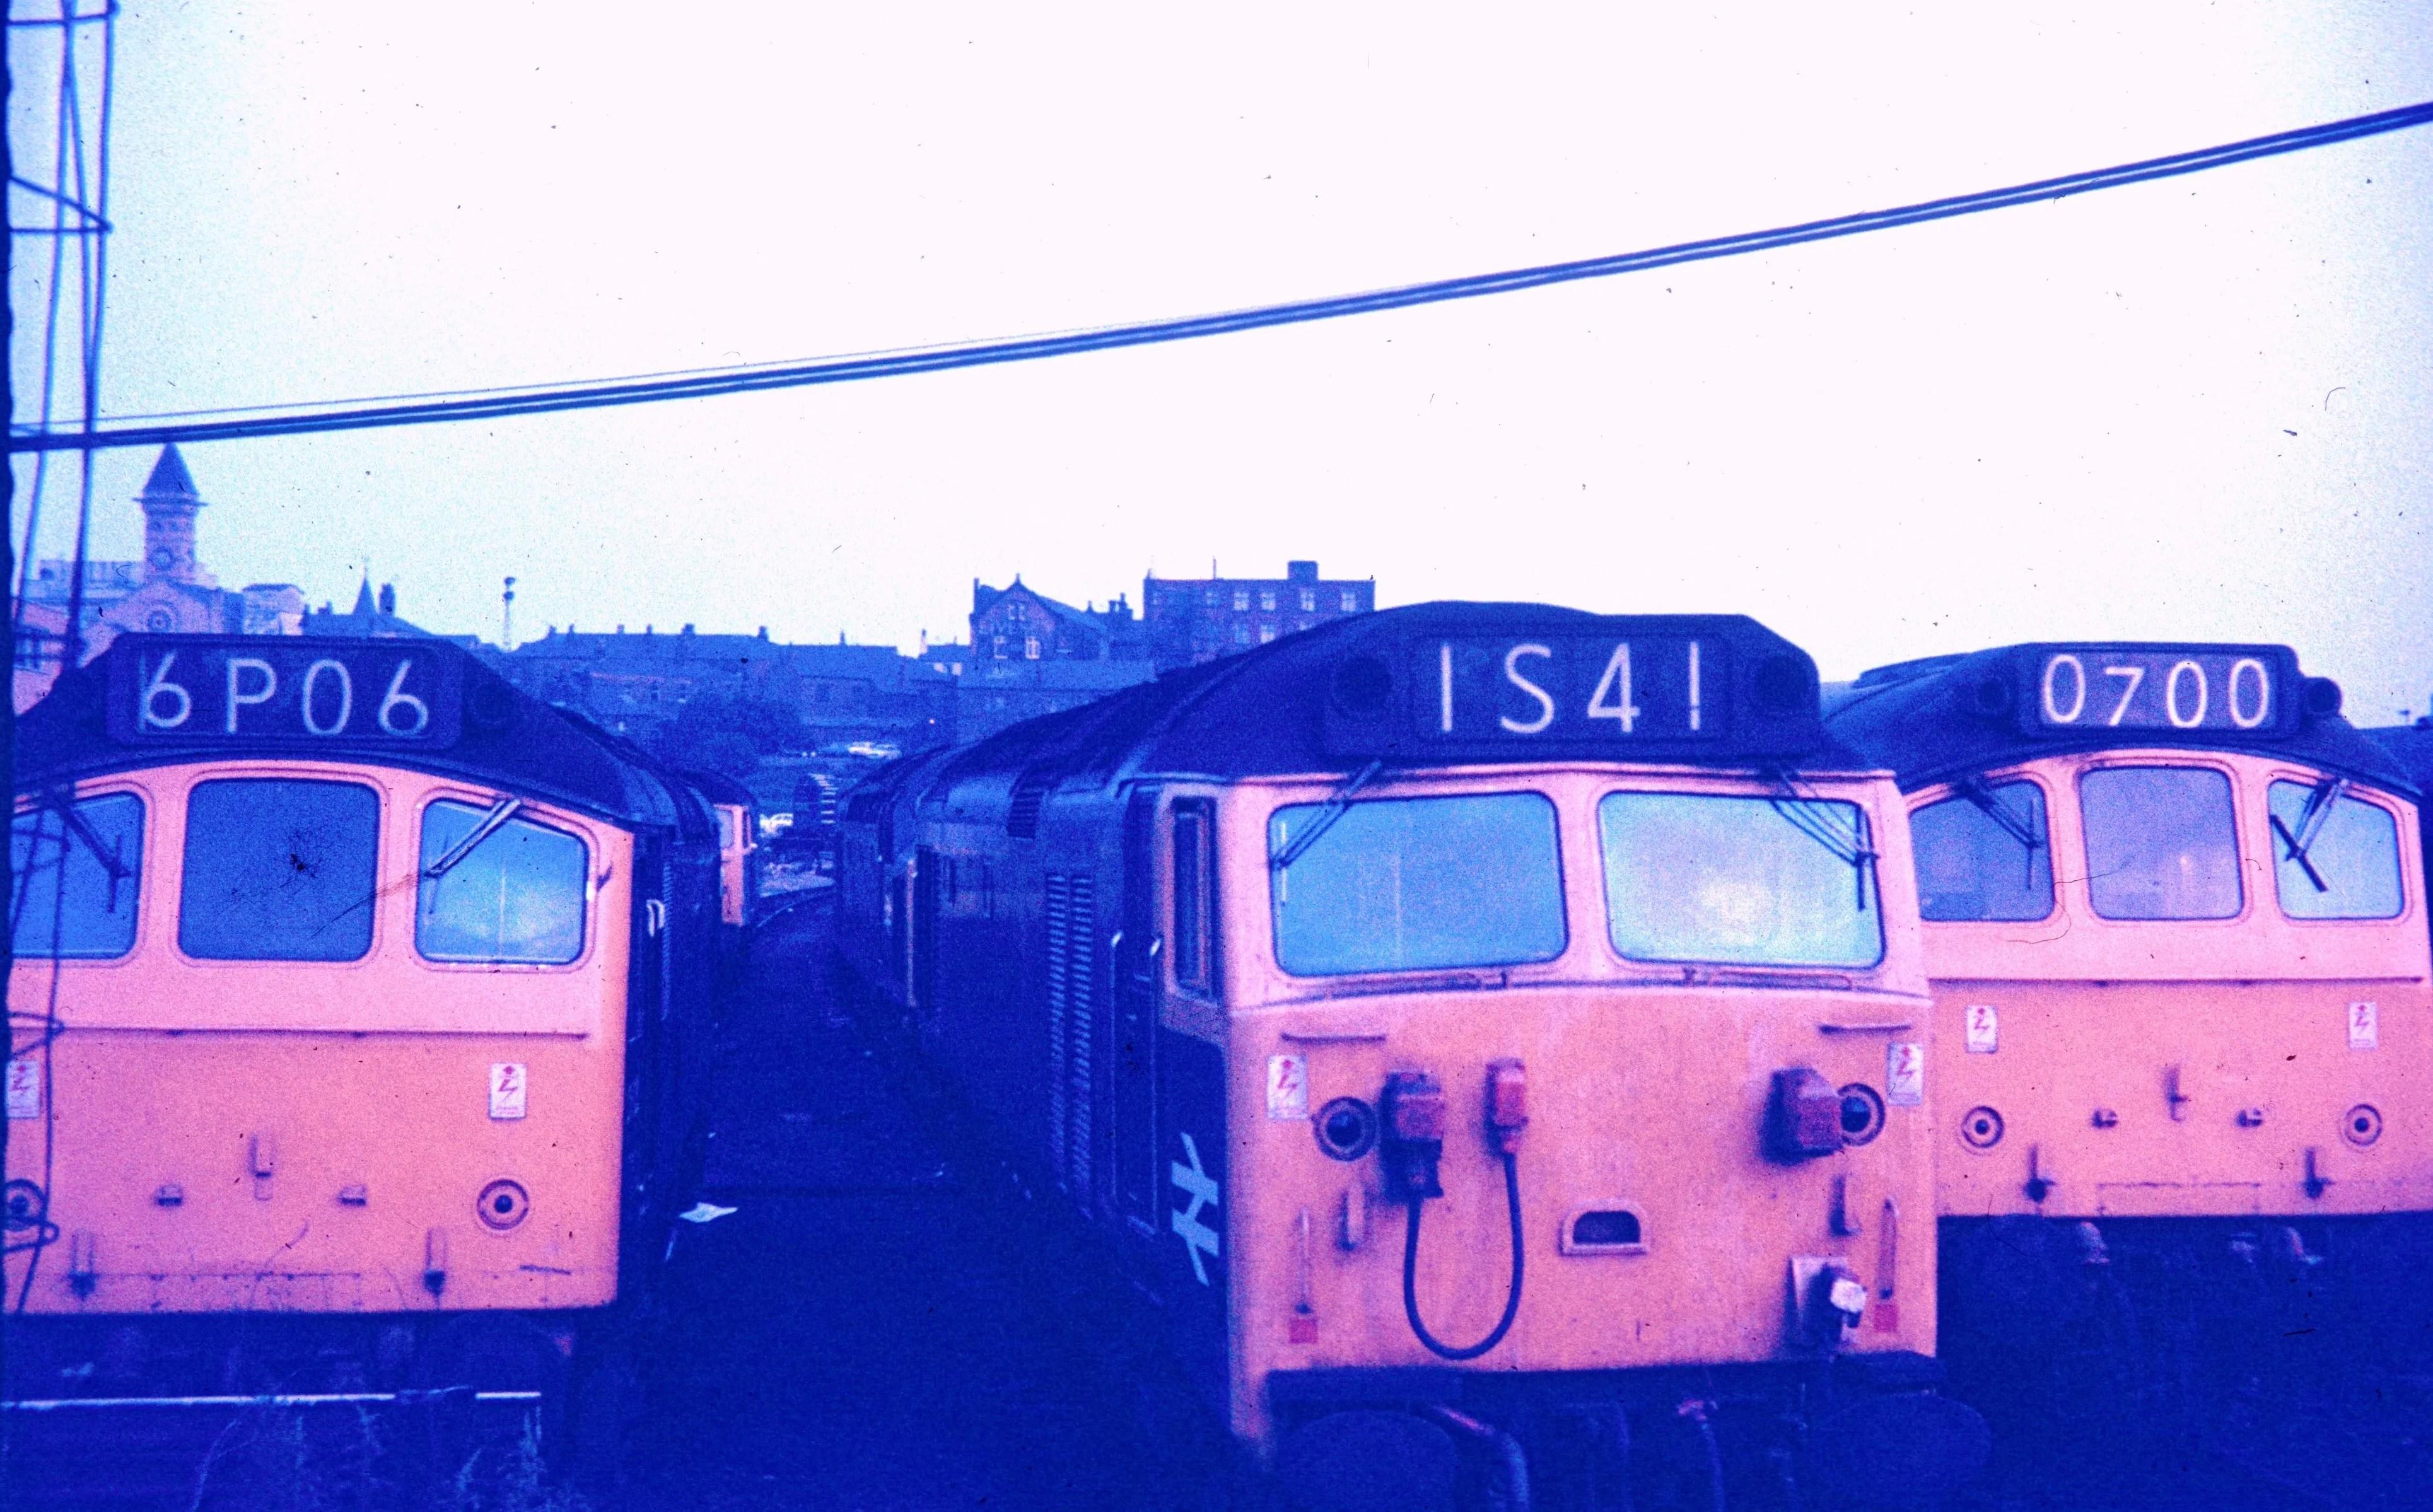 Class 50 diesel locomotive sandwiched between two Class 25 diesel locomotives at Preston